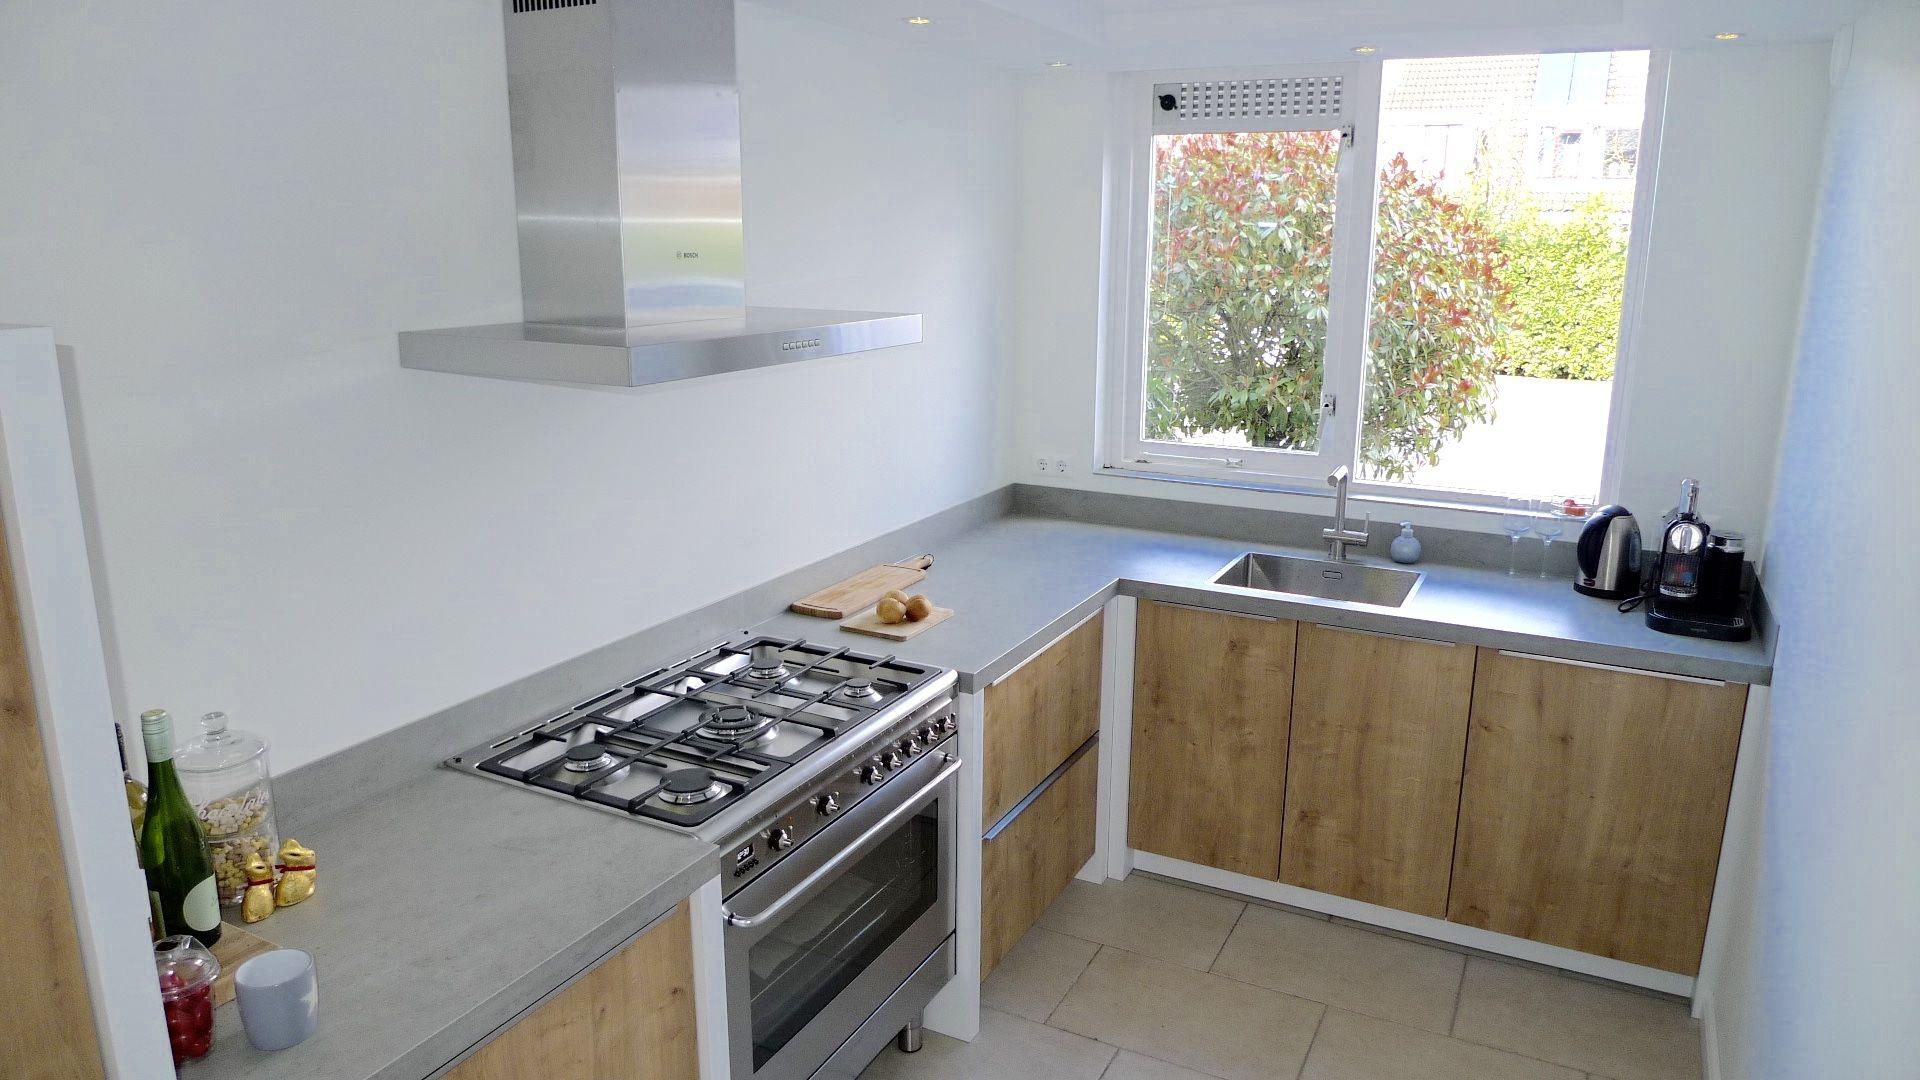 Houten Keuken Beton : Betonnen werkblad keuken